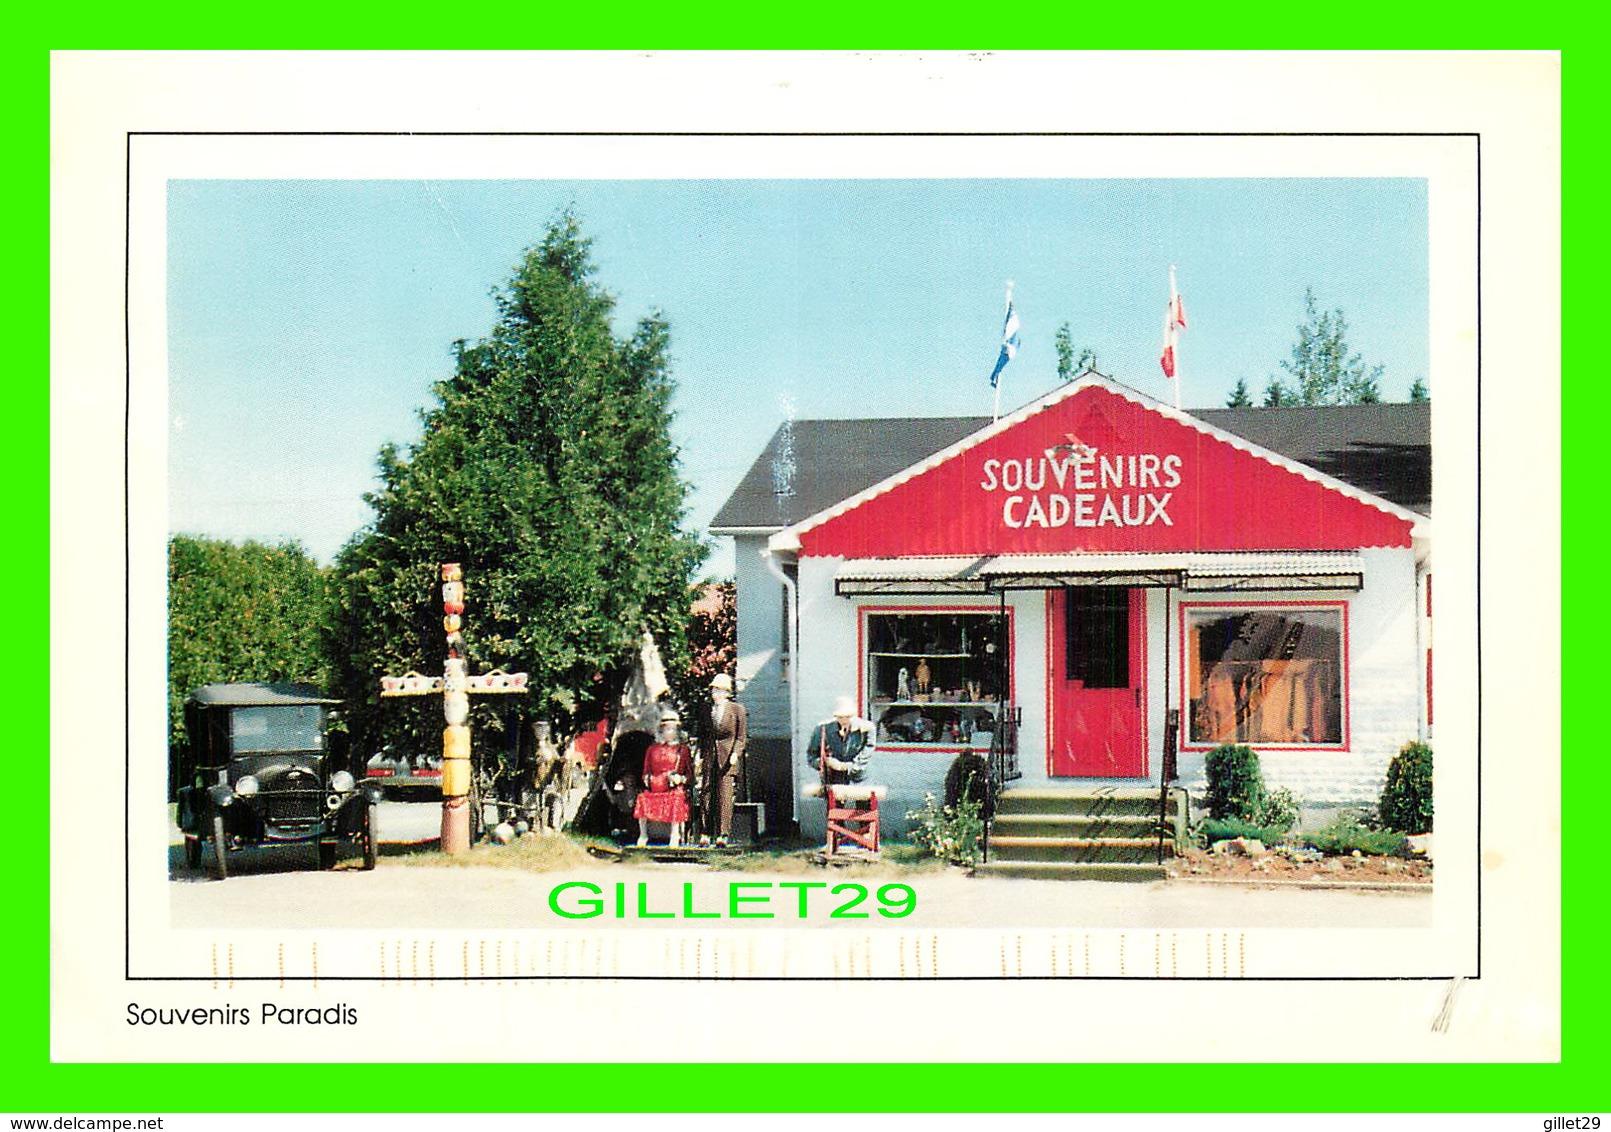 SAINT-JOVITE, QUÉBEC - MAGASIN SOUVENIRS PARADIS - CIRCULÉE EN 1999 - - Quebec